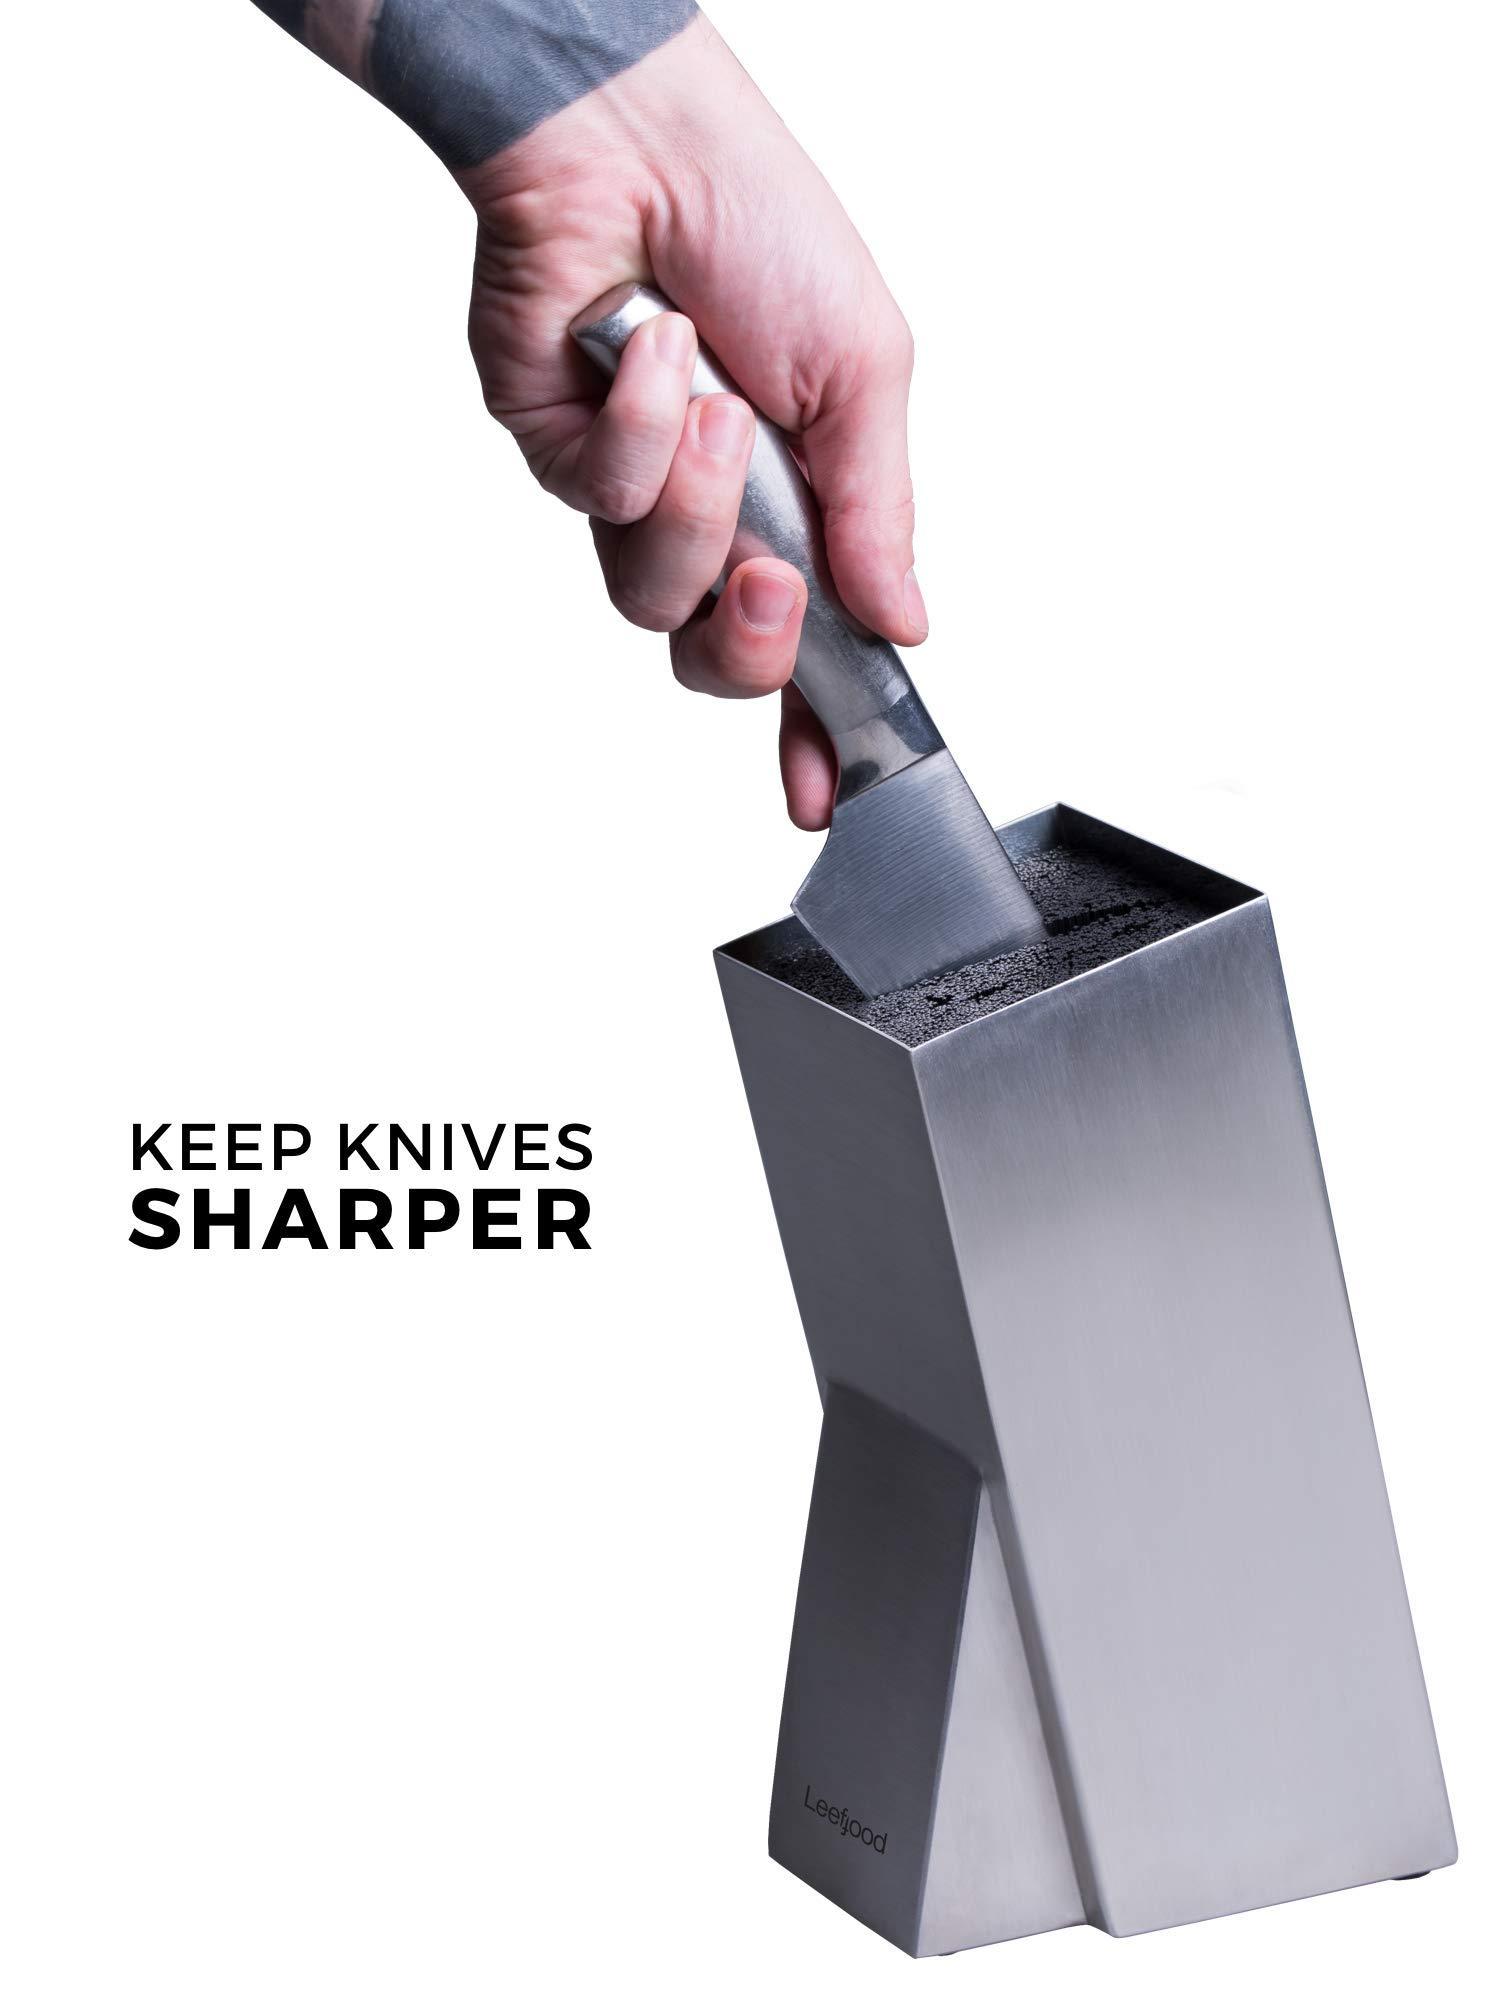 Universal Stainless Steel Knife Block Organizer – For Safe Kitchen Knife Holder Easy Clean Dishwasher Safe – Space Saver Knife Storage Stand by Leeffood (Image #3)